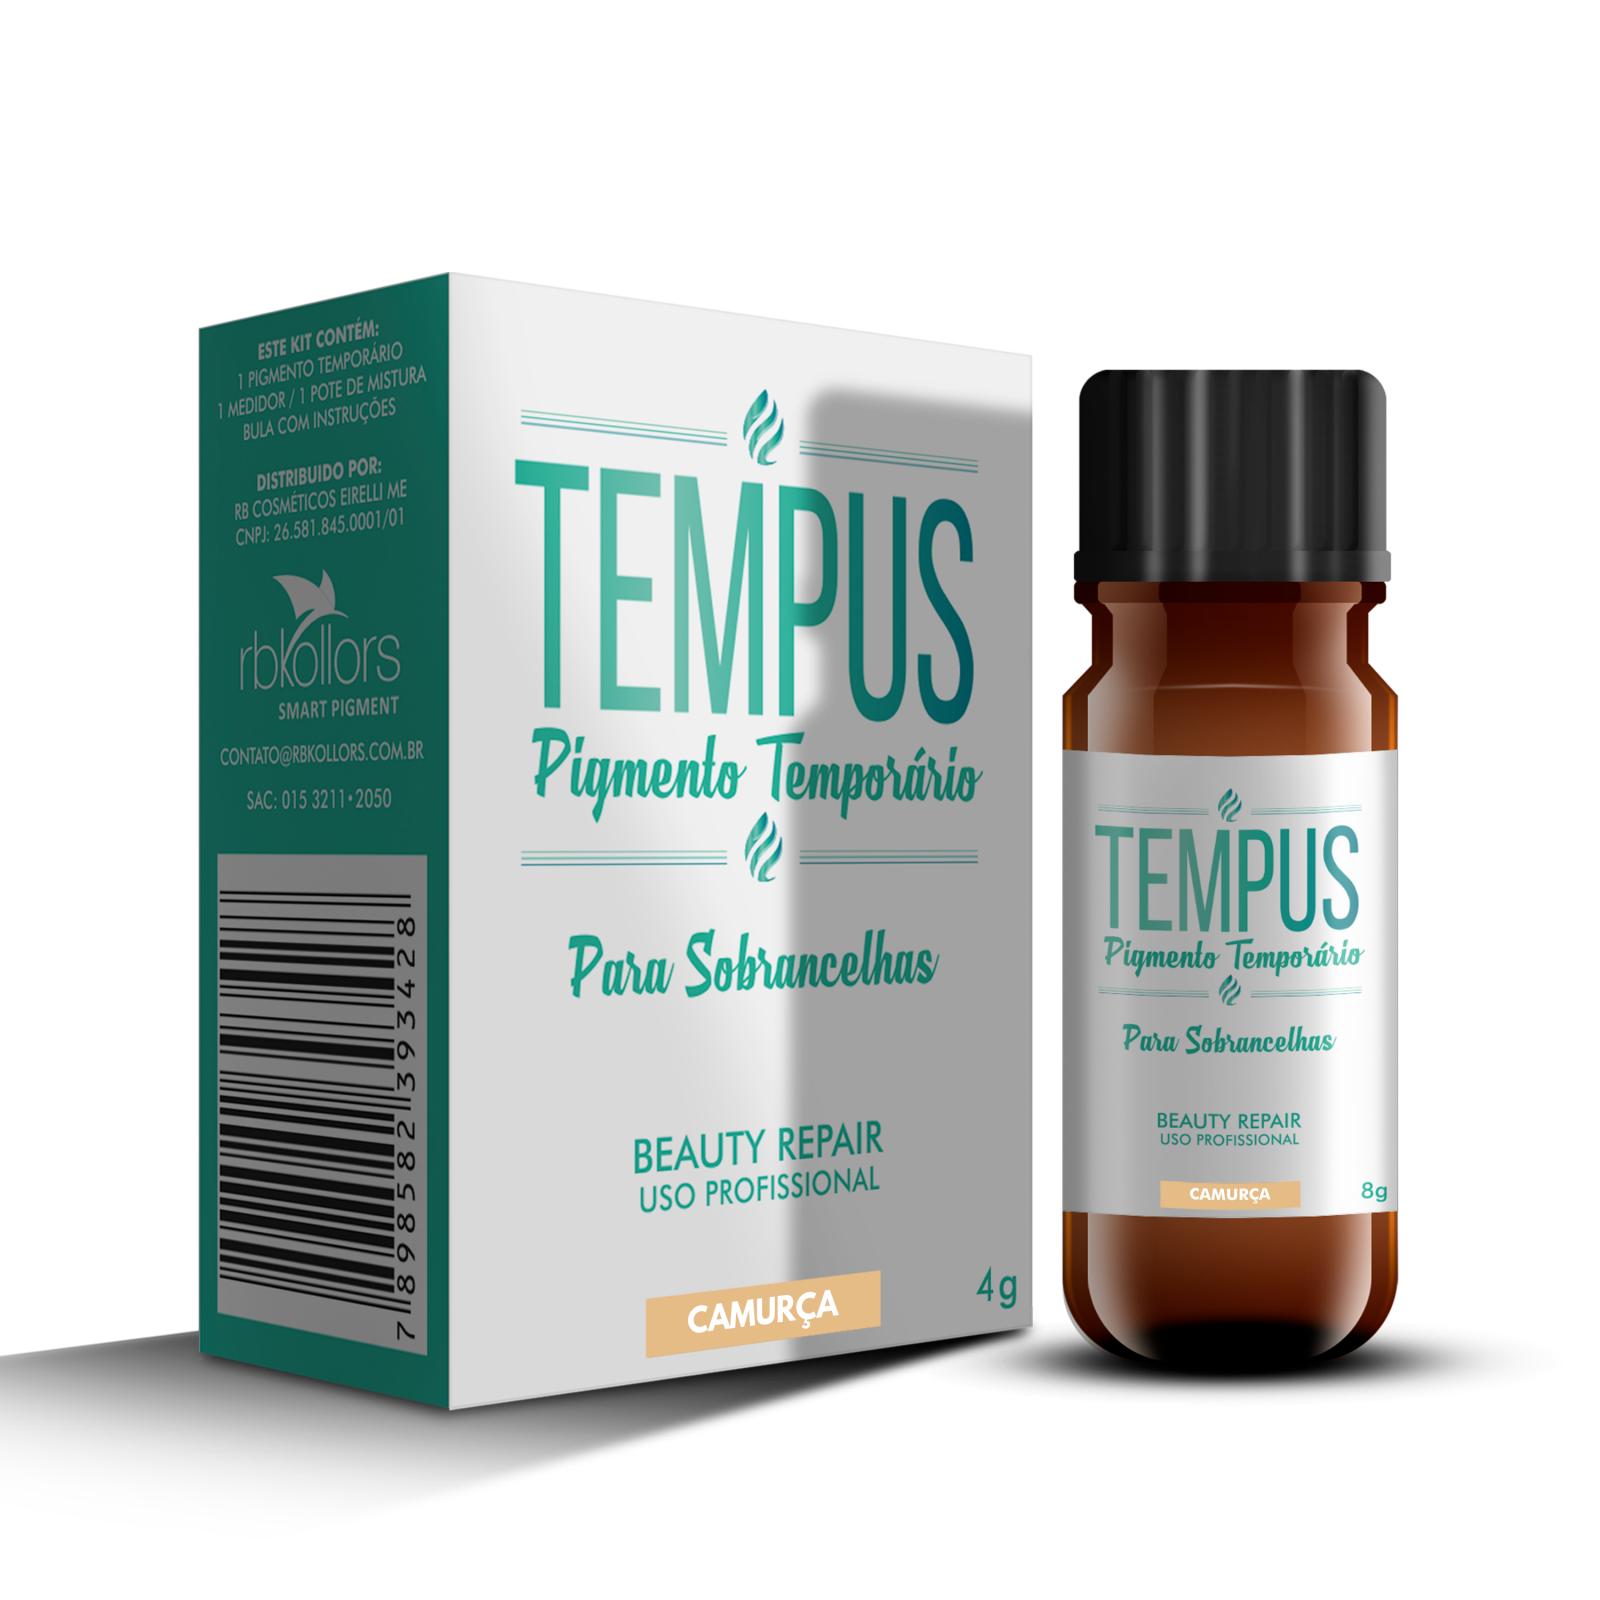 TEMPUS PIGMENTO TEMPORARIO CAMURCA 4G - RB Kollors